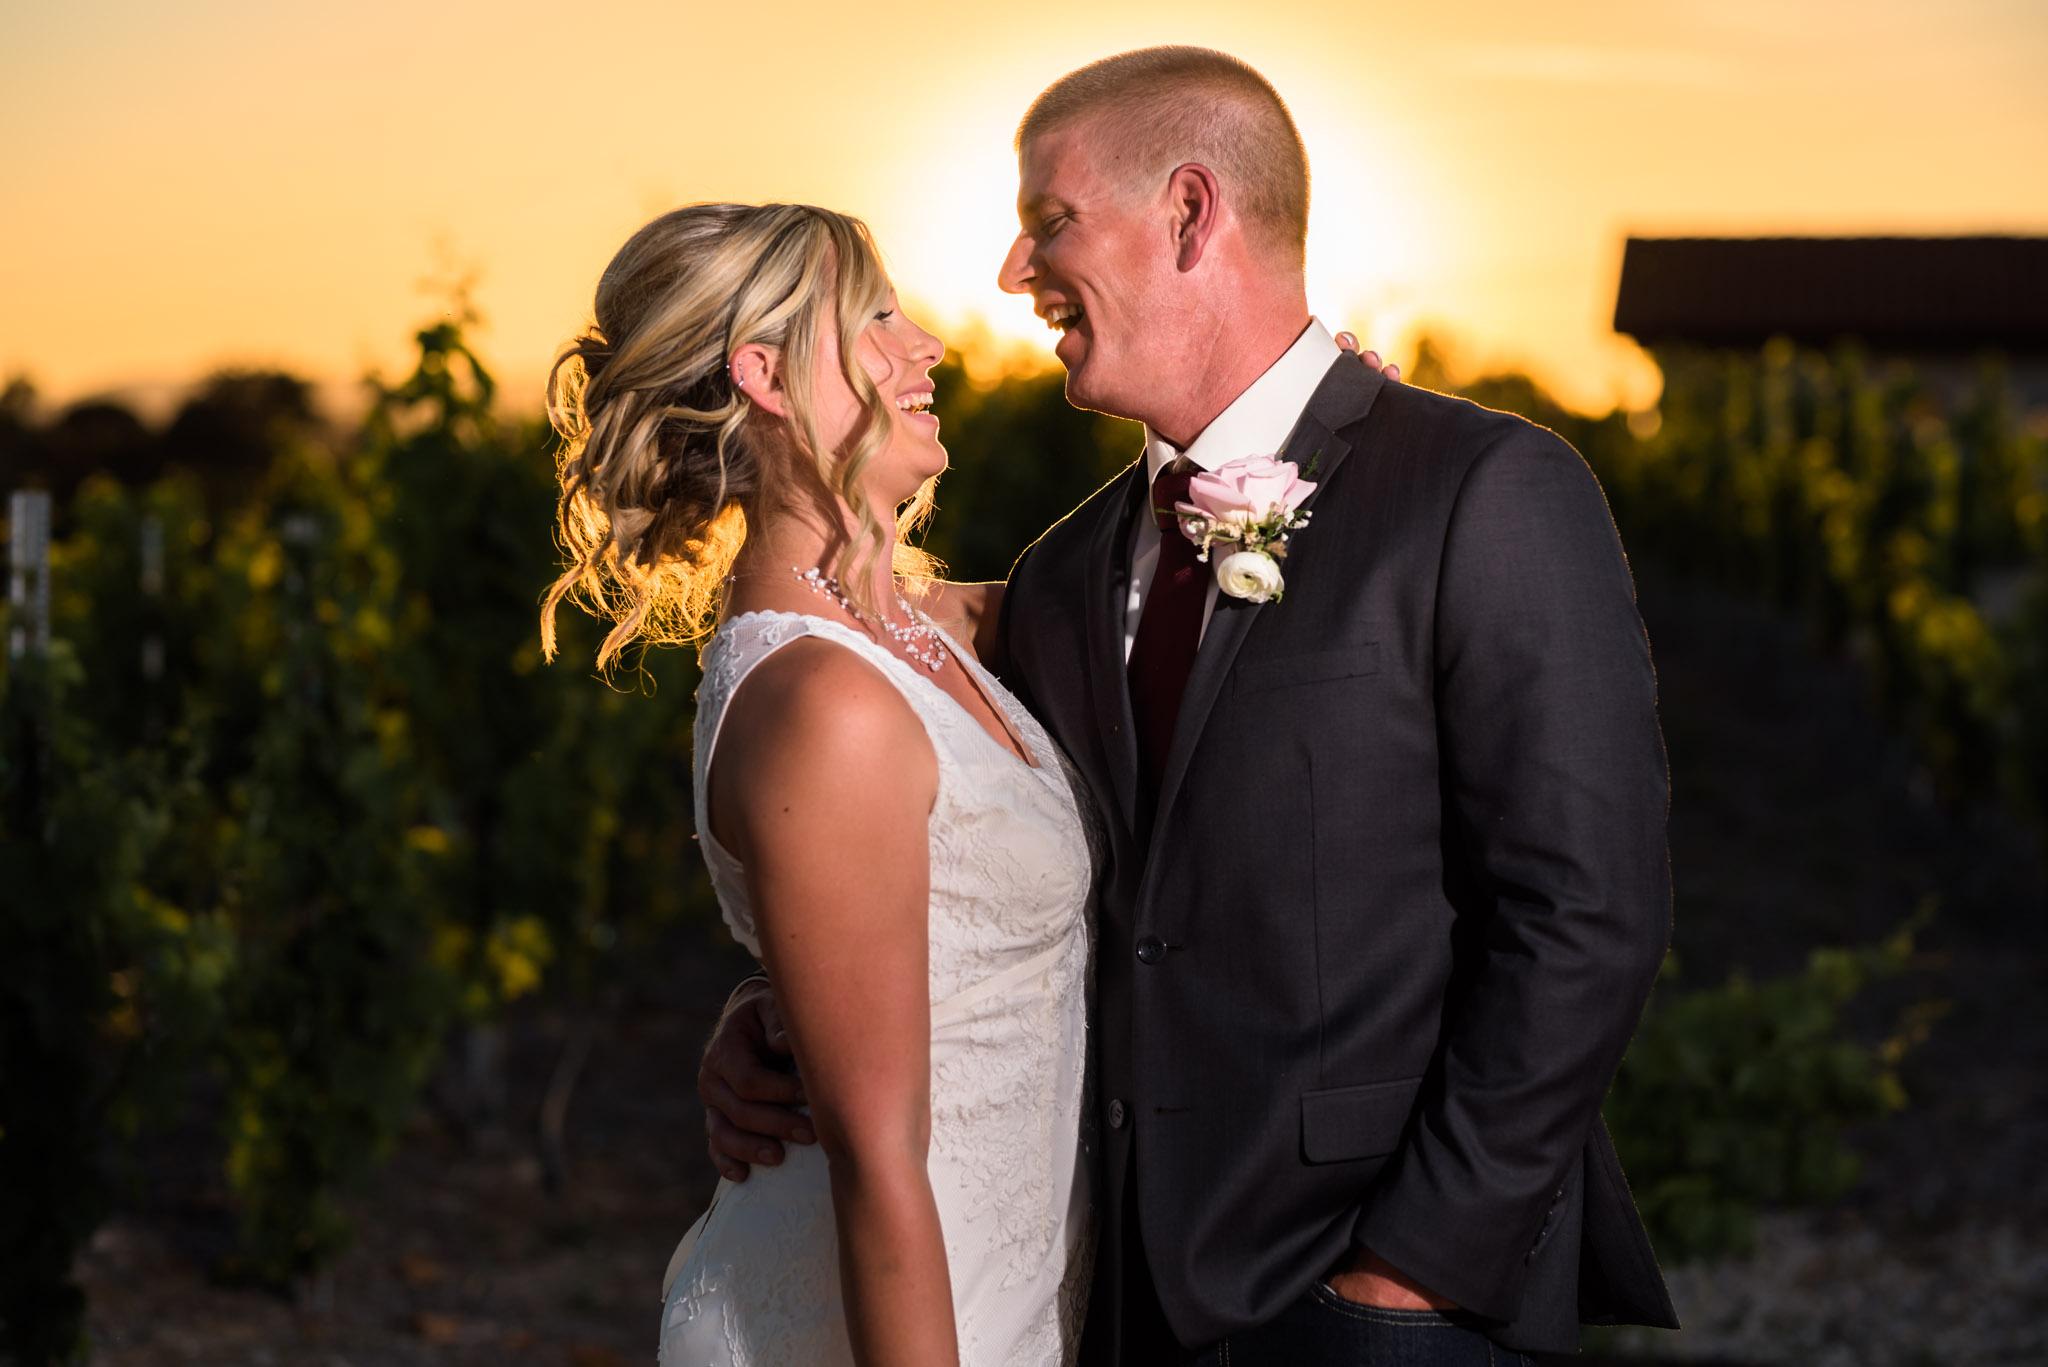 Avensole-Winery-Temecula-Wedding-Josh-and-Olivia-3796.JPG